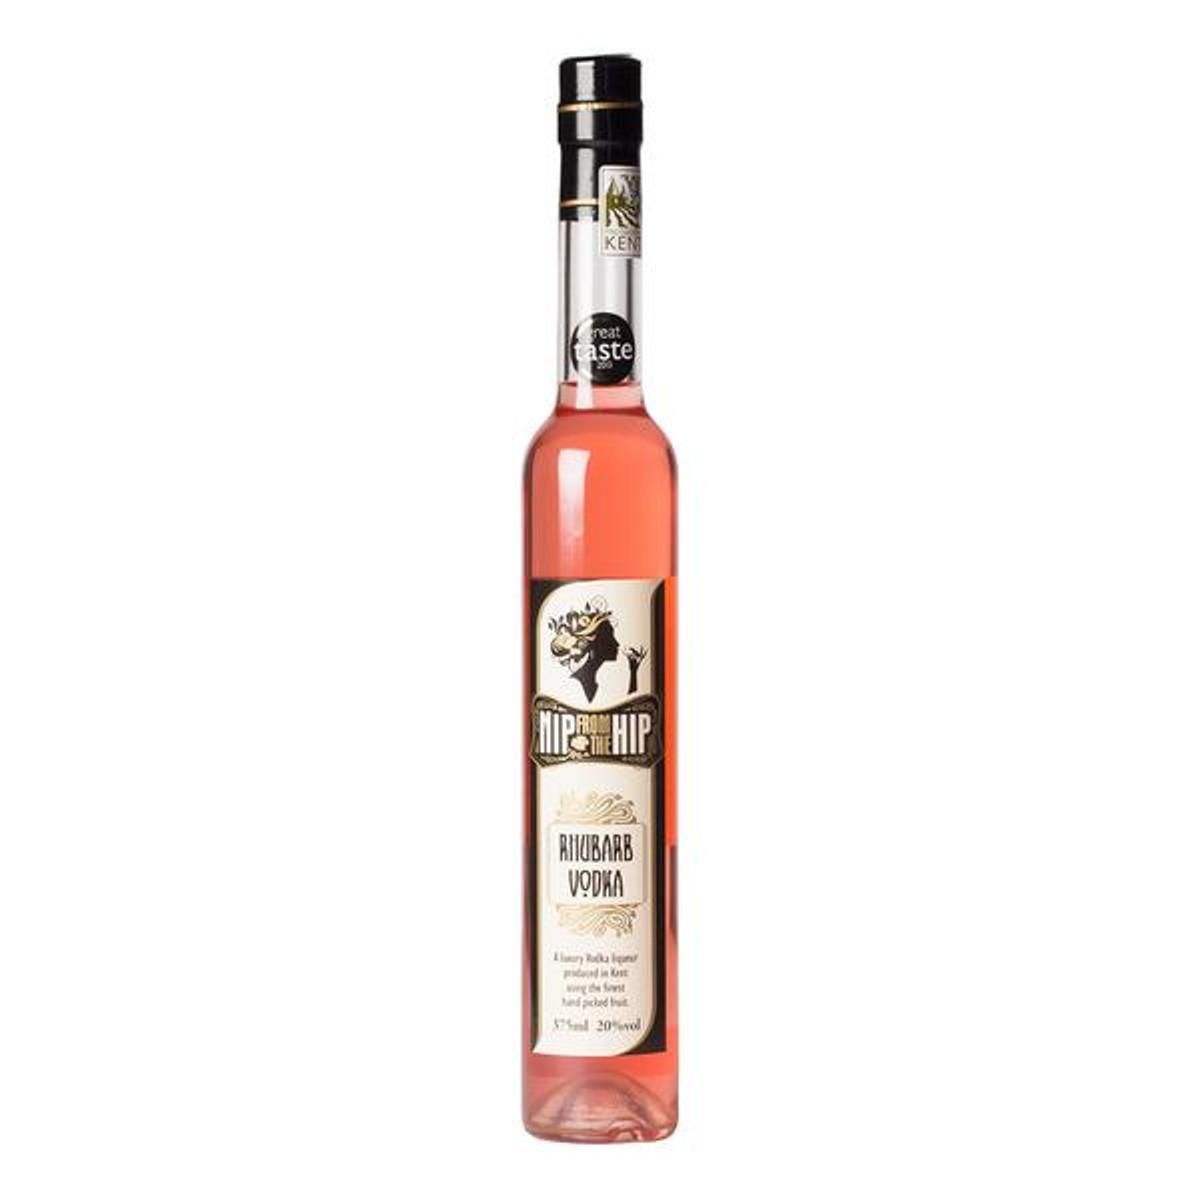 Rhubarb Vodka Liqueur